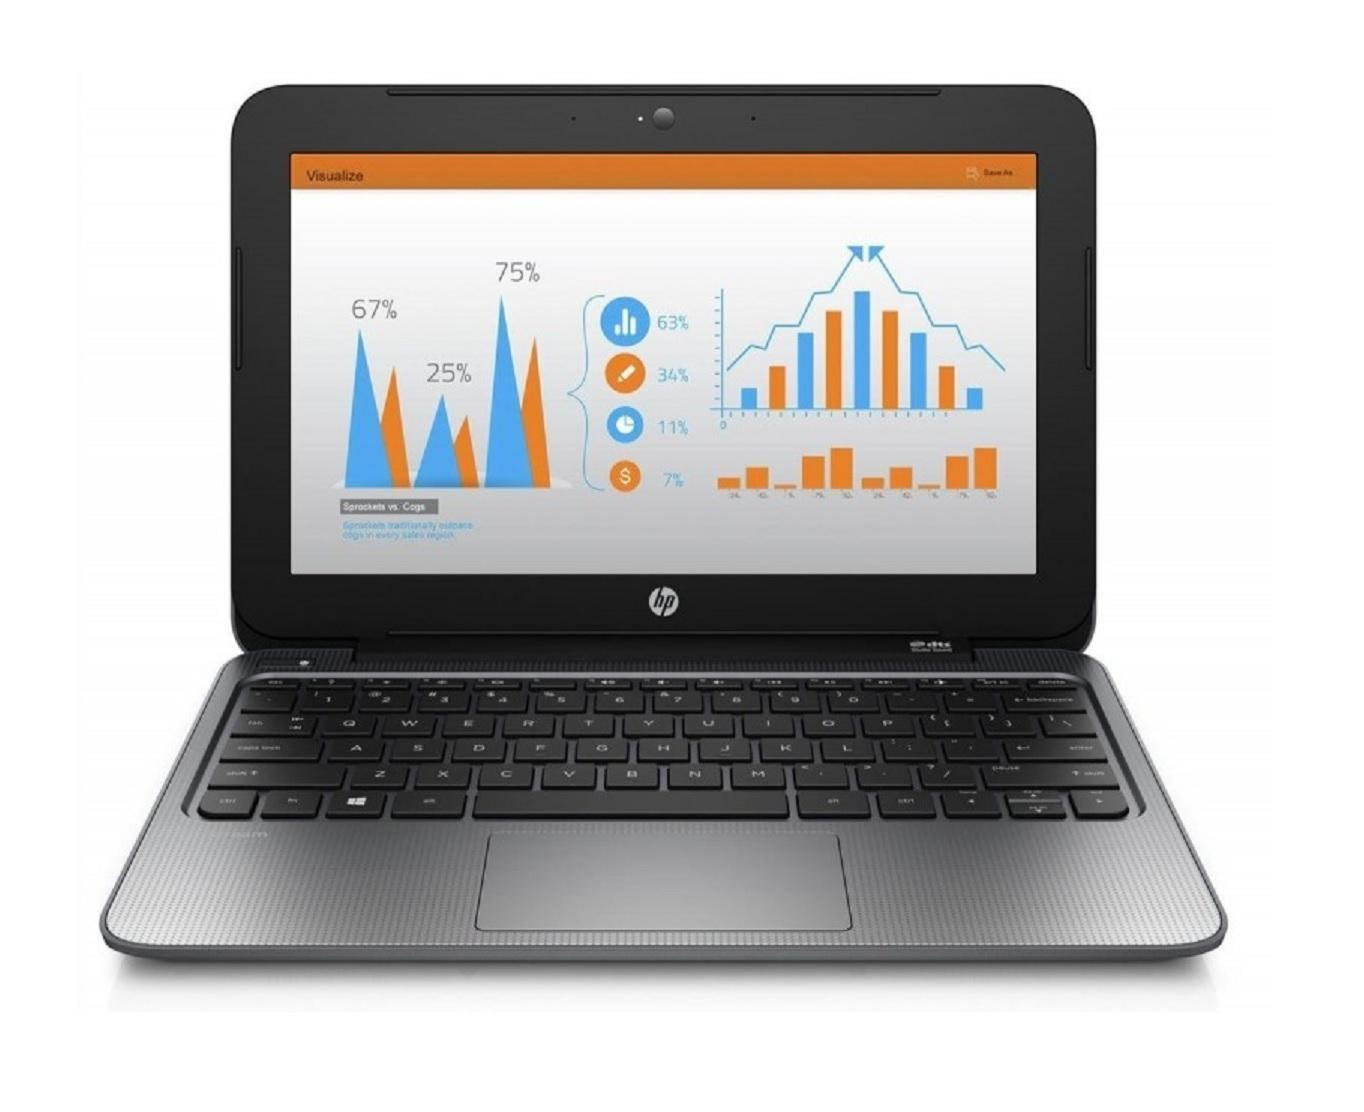 HP%20Stream%20N2840.jpg